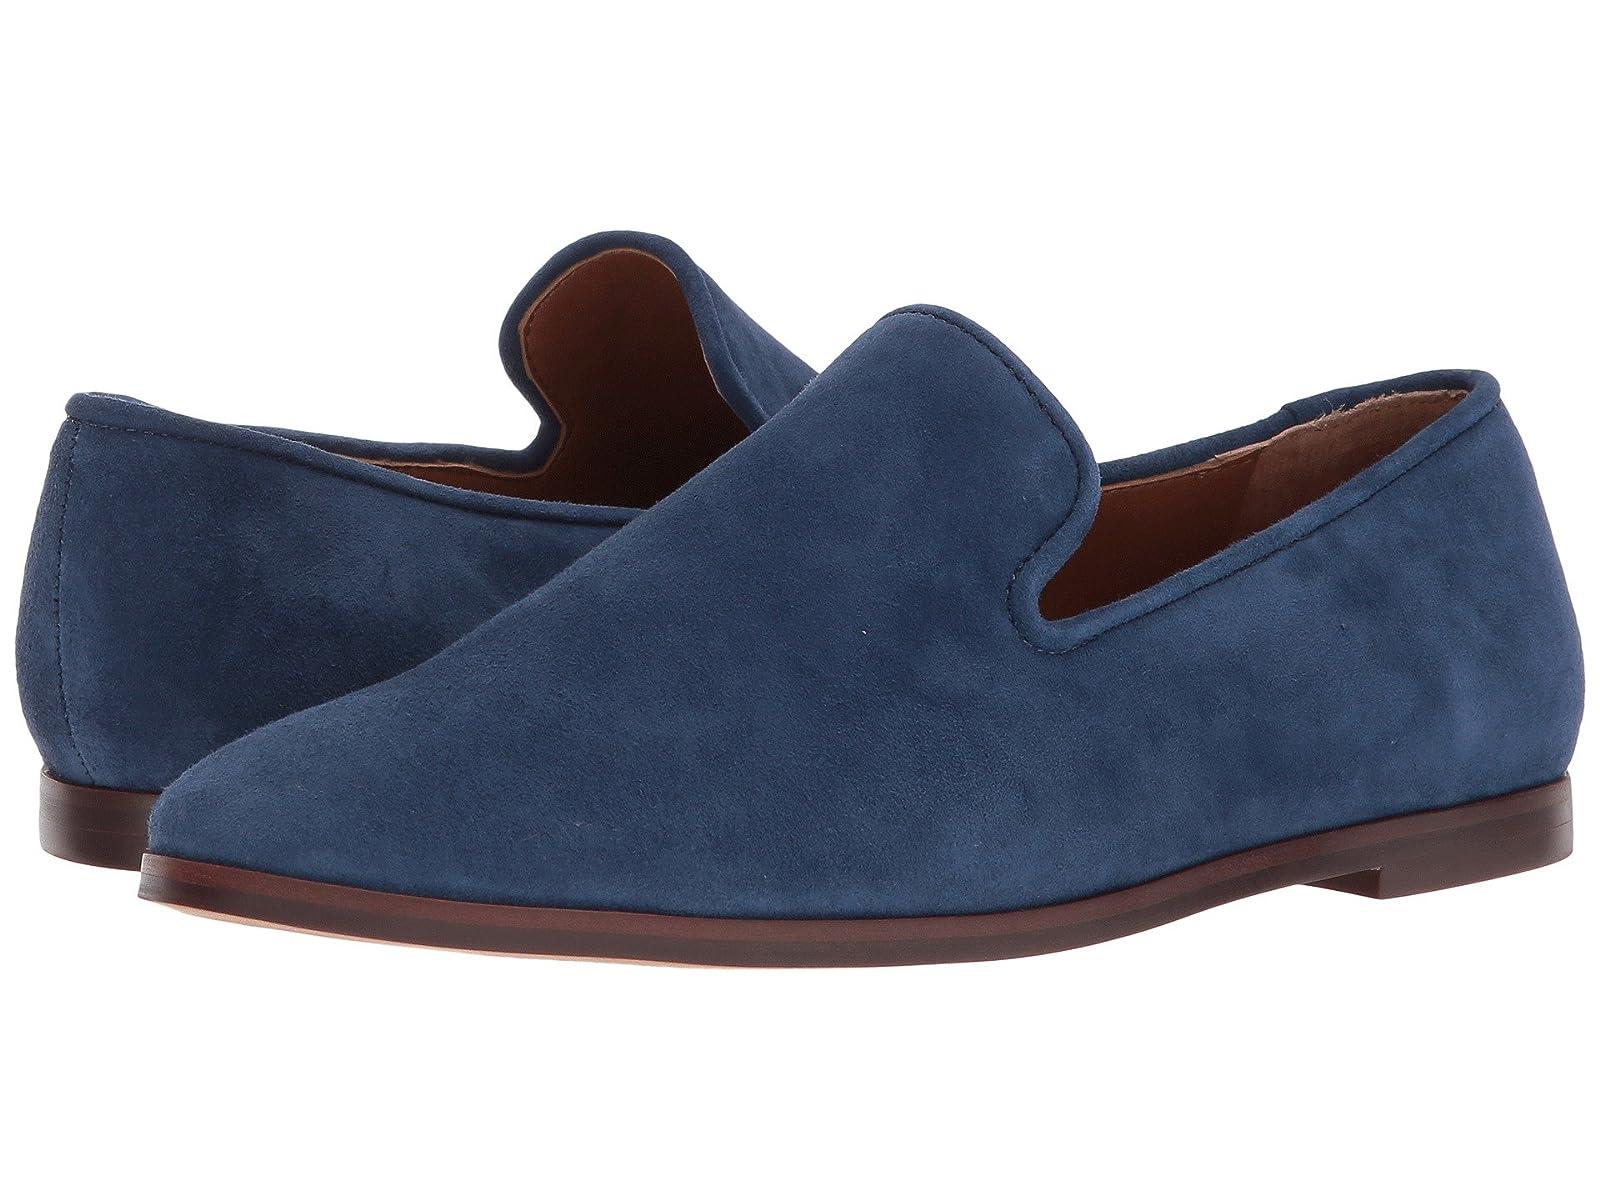 Franco Sarto Rachella by SARTOCheap and distinctive eye-catching shoes